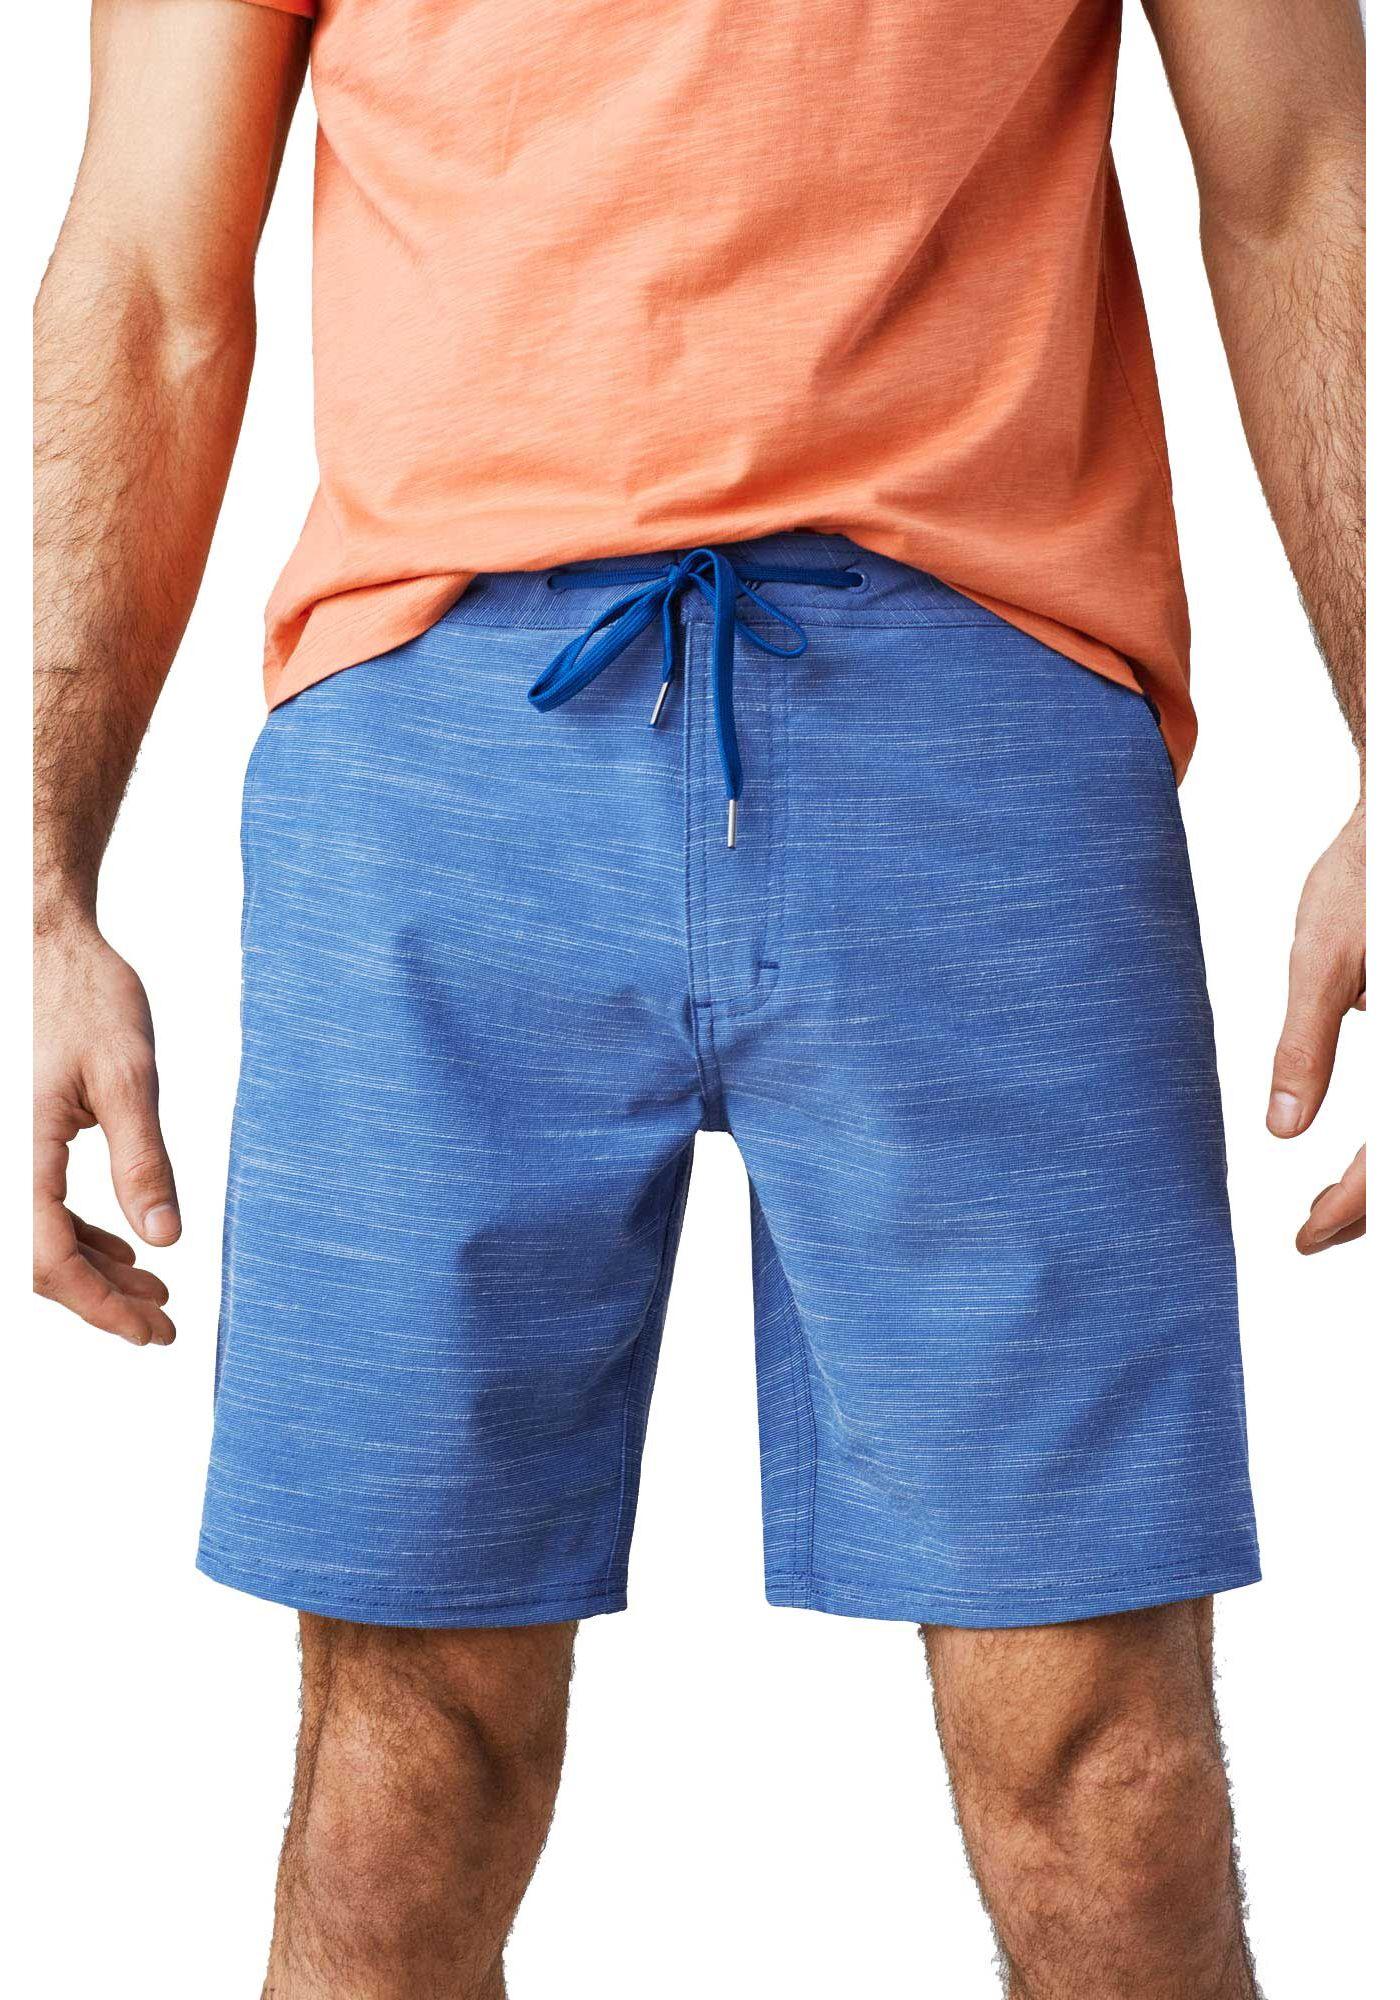 United by Blue Men's Hoy Shorts